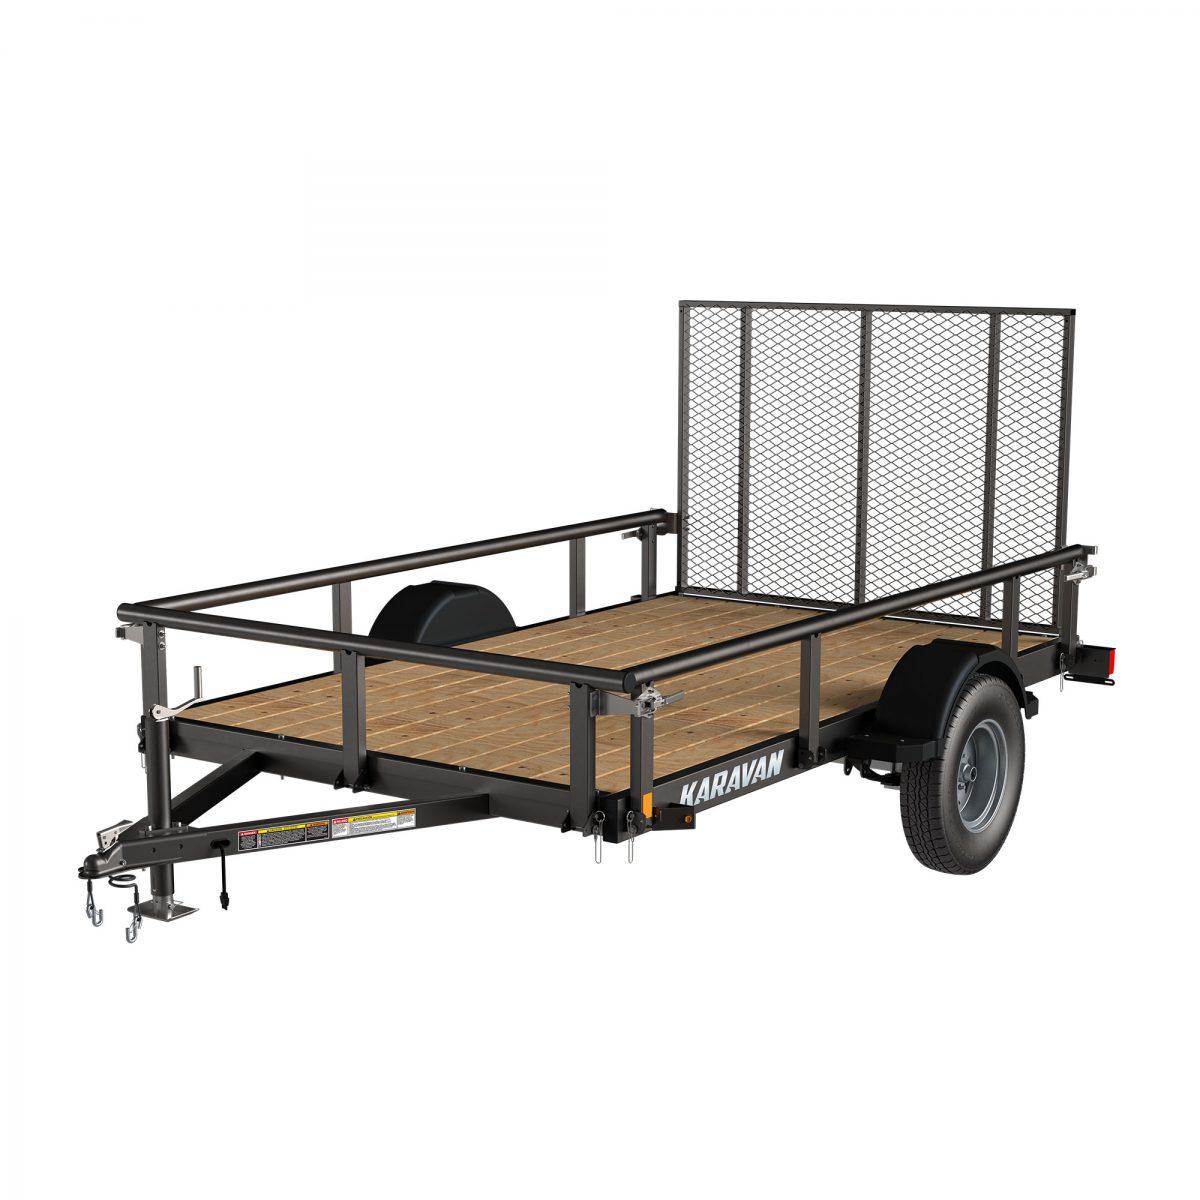 Karavan 6 X 10 FT. STEEL UTILITY TRAILER